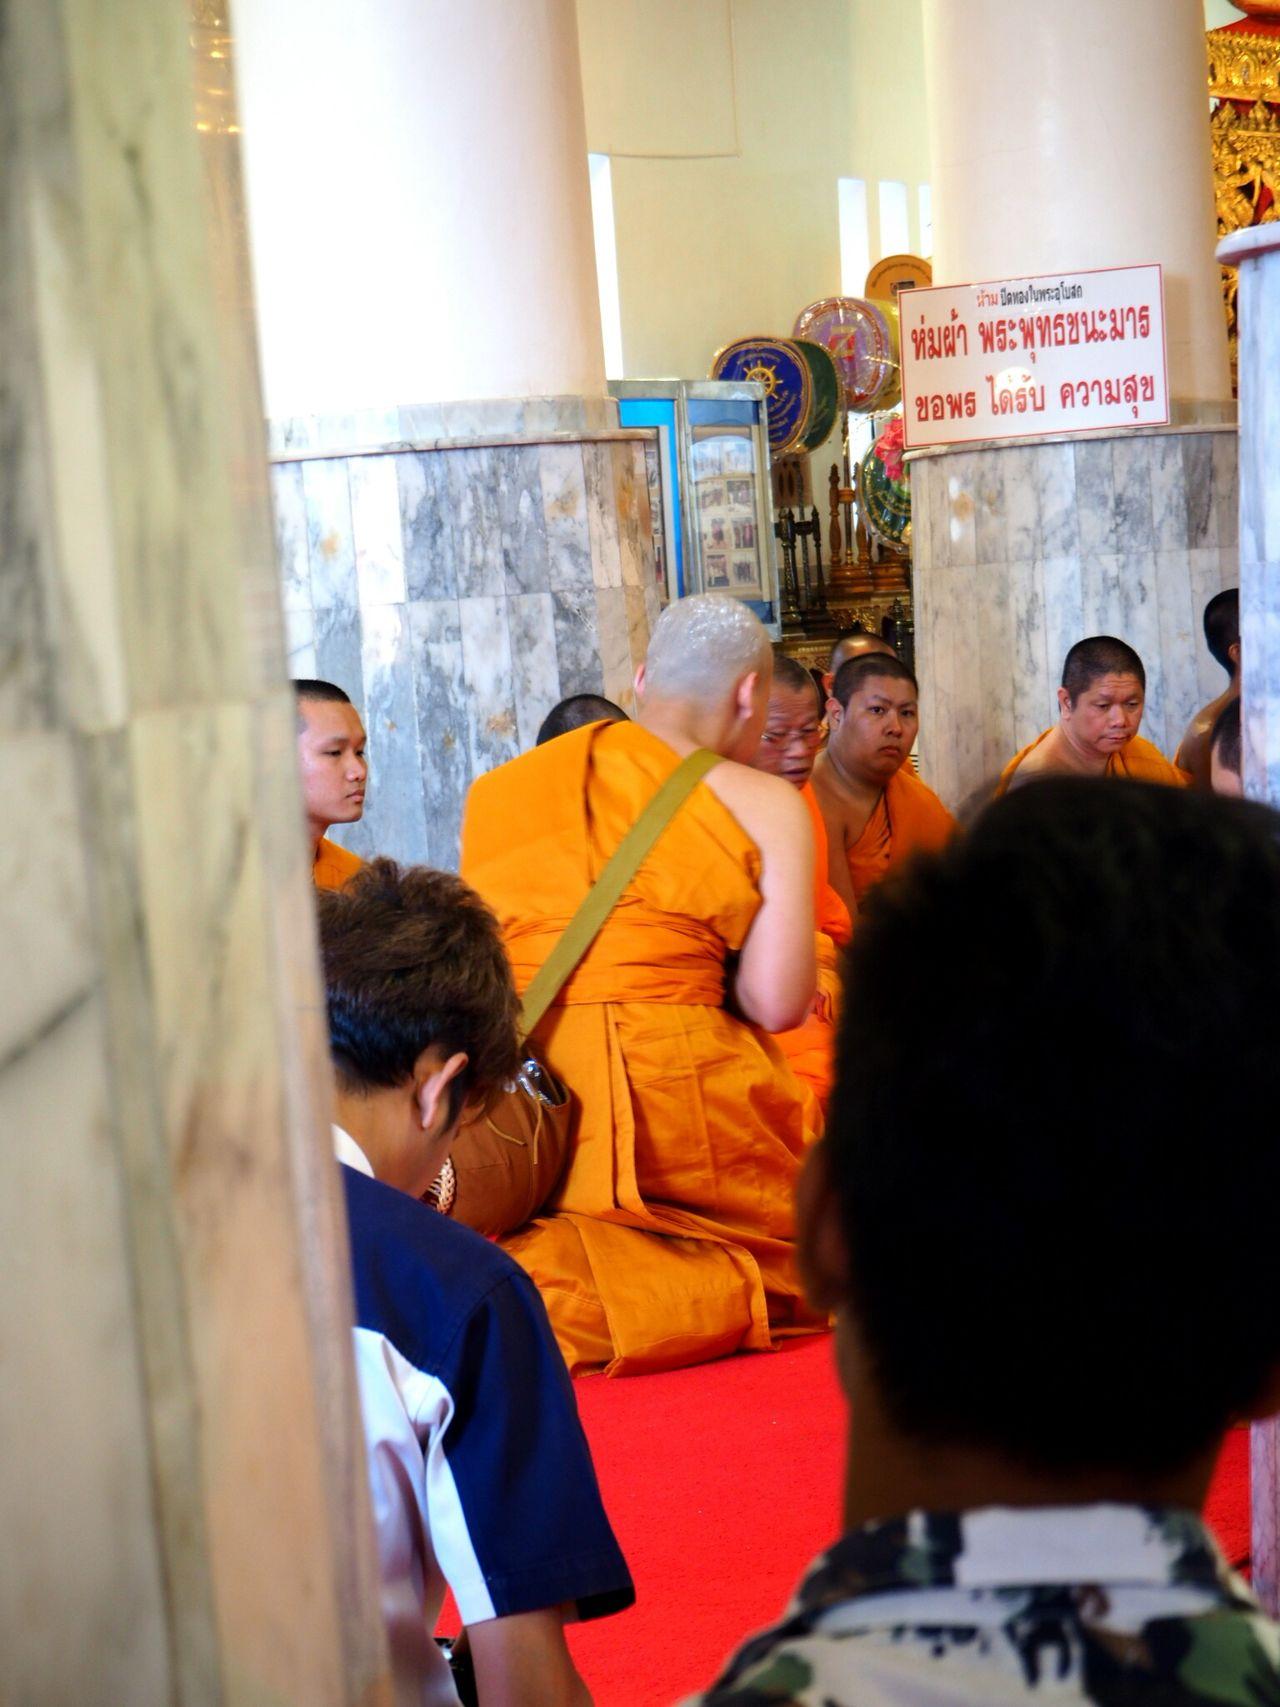 Monkhood Ayutthaya | Thailand ประเทศไทย Brother Ayudhaya My Memories Buddhist Monks Happy to see what you do, Bro ~~